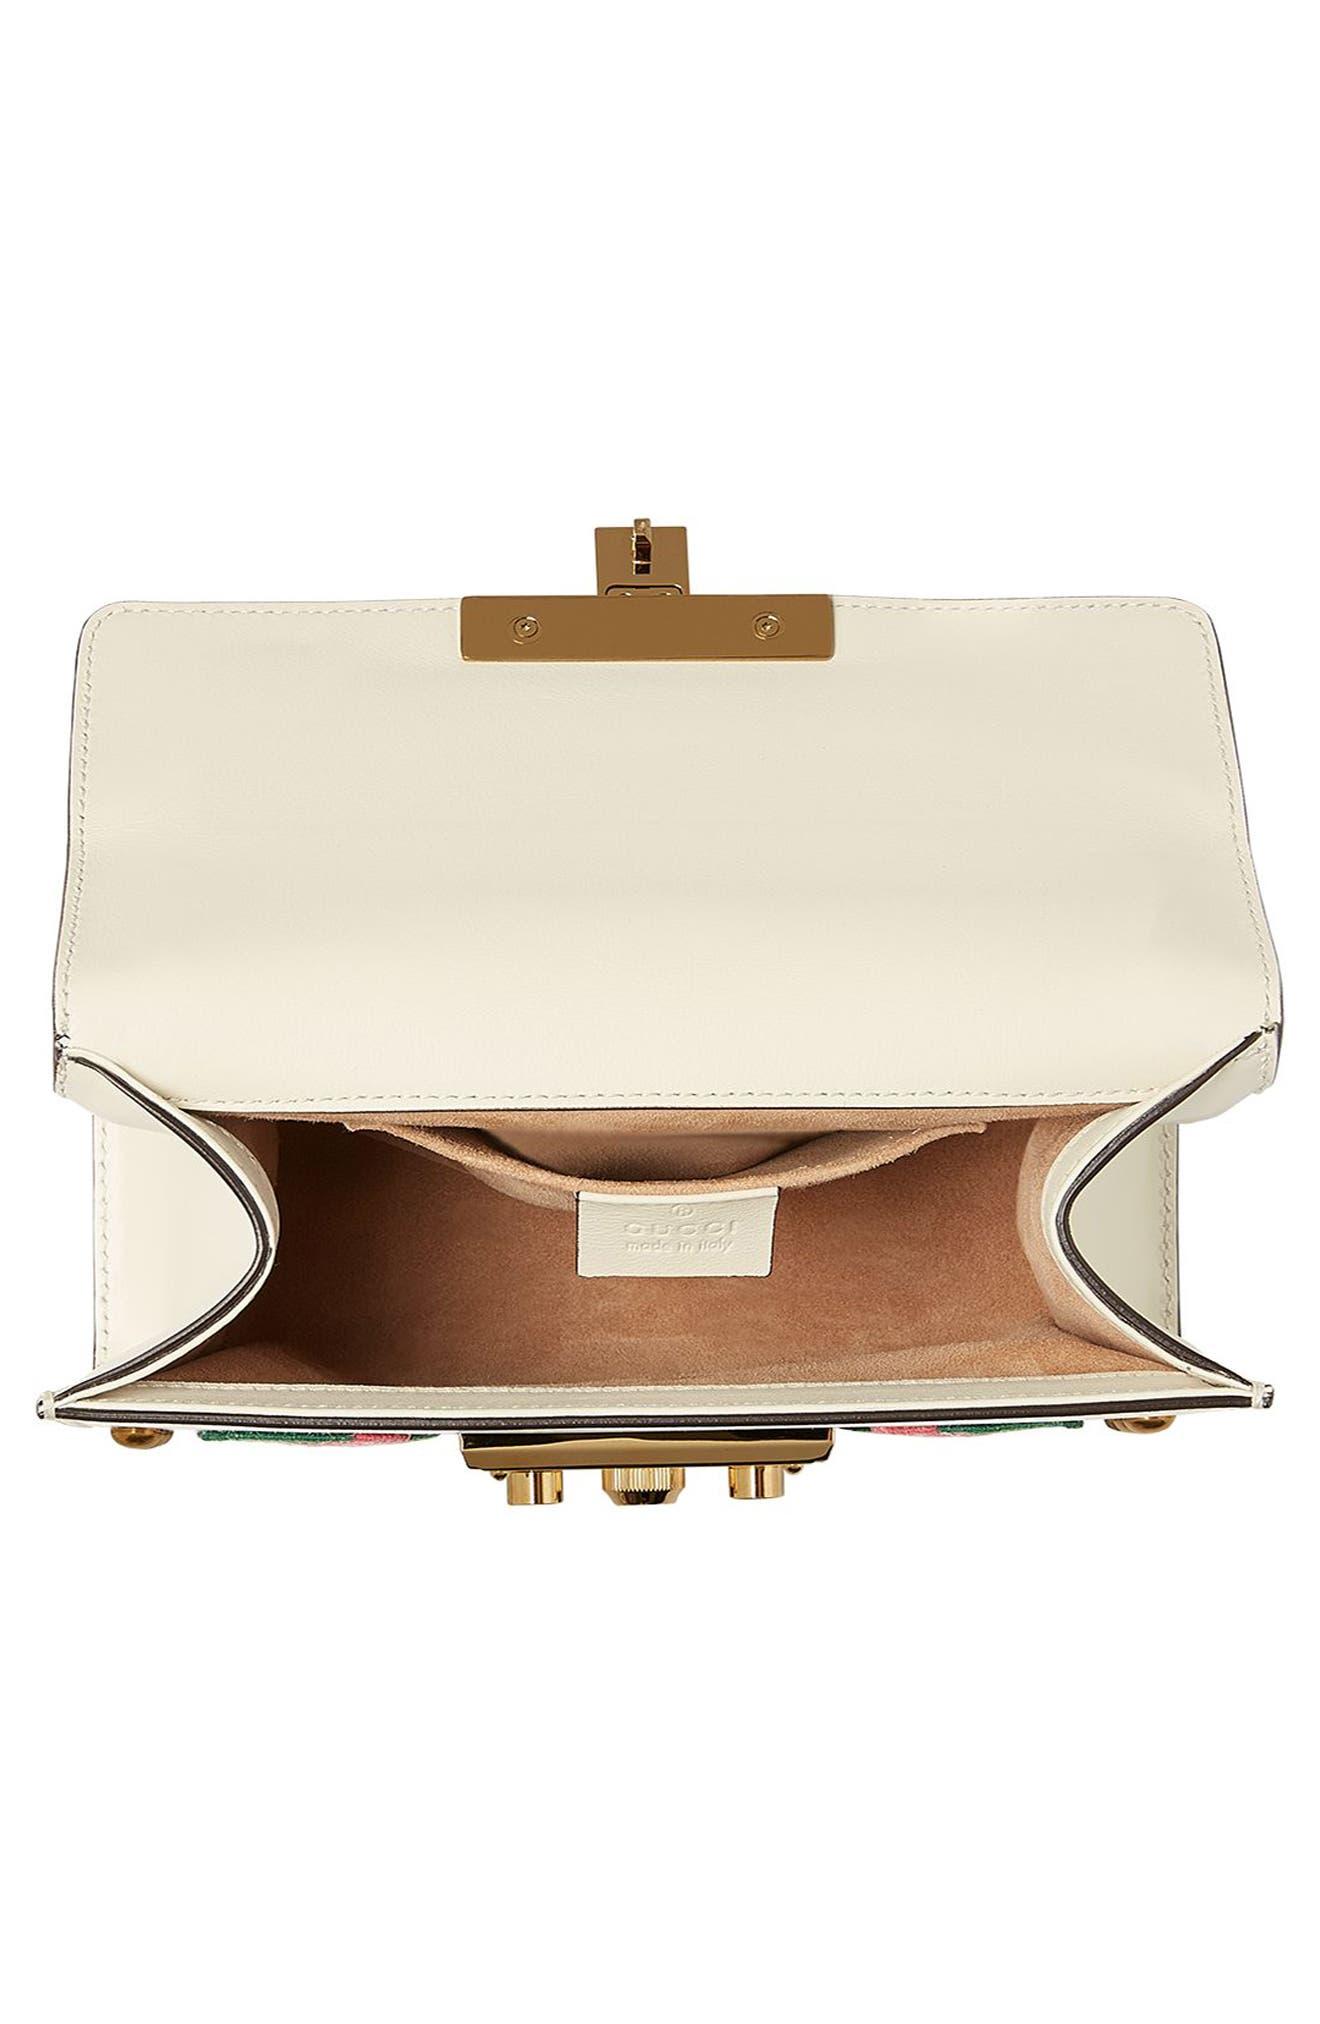 Alternate Image 3  - Gucci Small Padlock Embroidered Leather Shoulder Bag